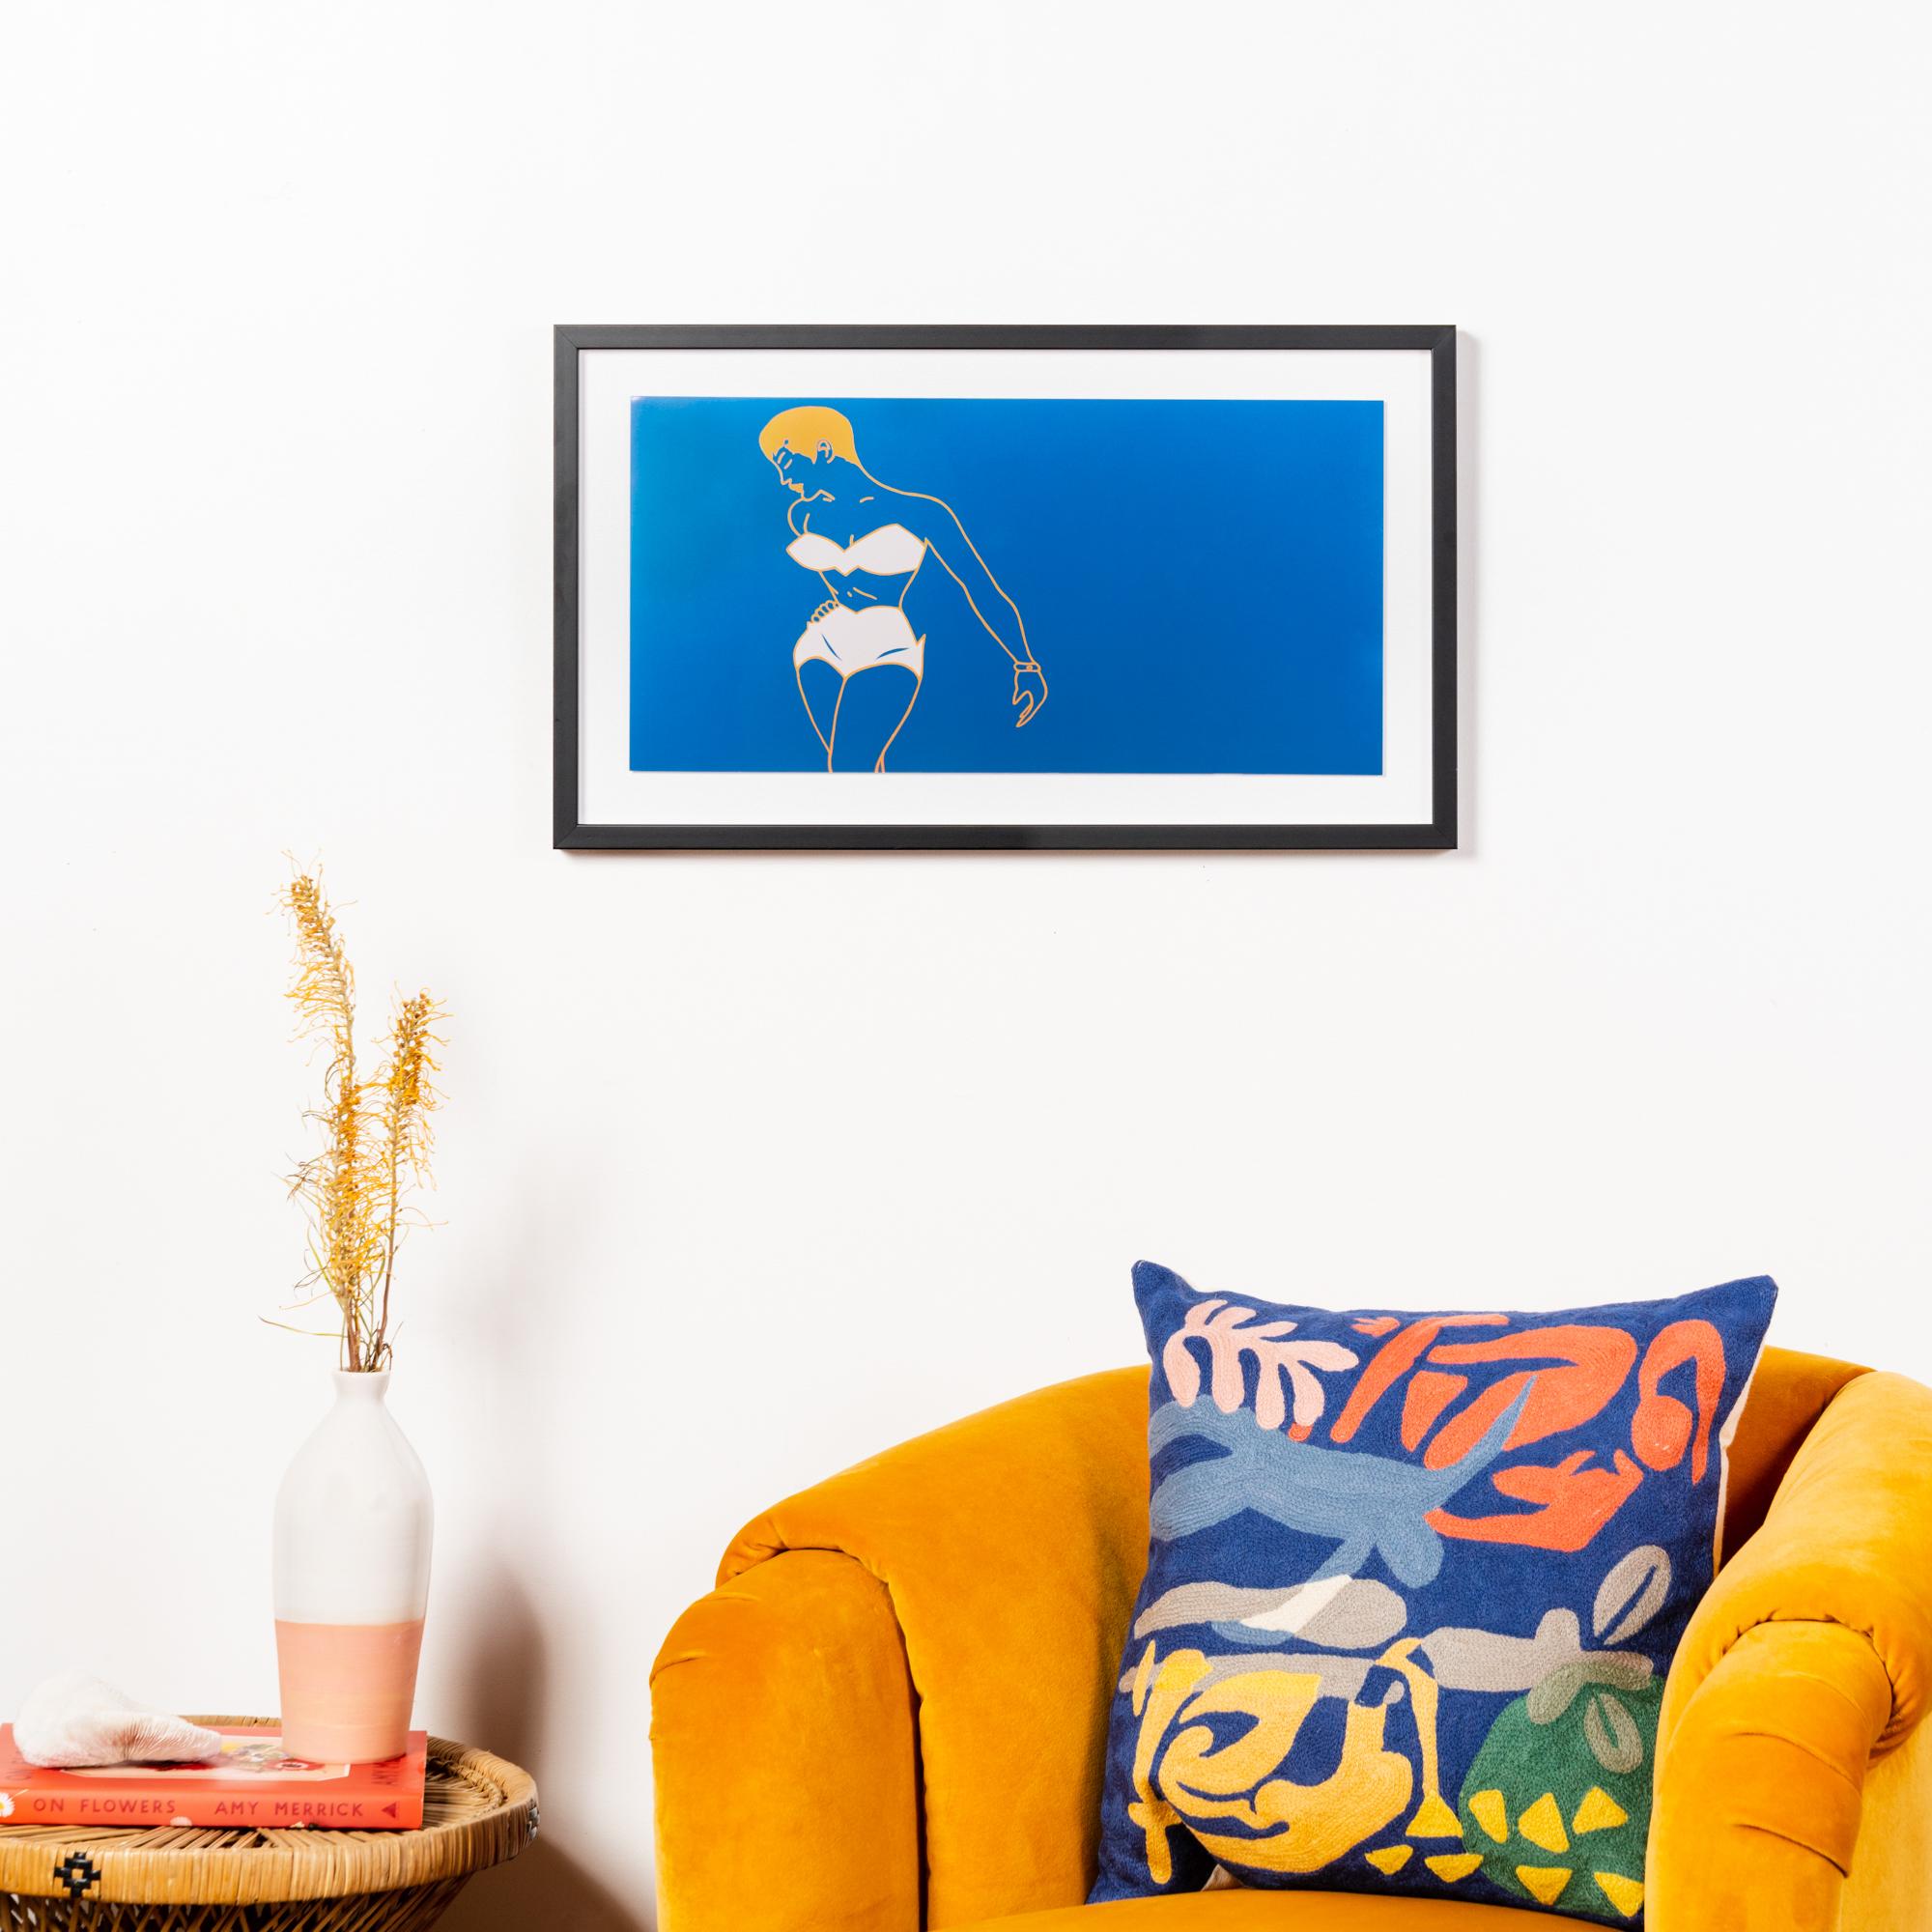 Framebridge Black Artists Print Shop Tracu Murrell Torchy framed print Mercer Slim frame